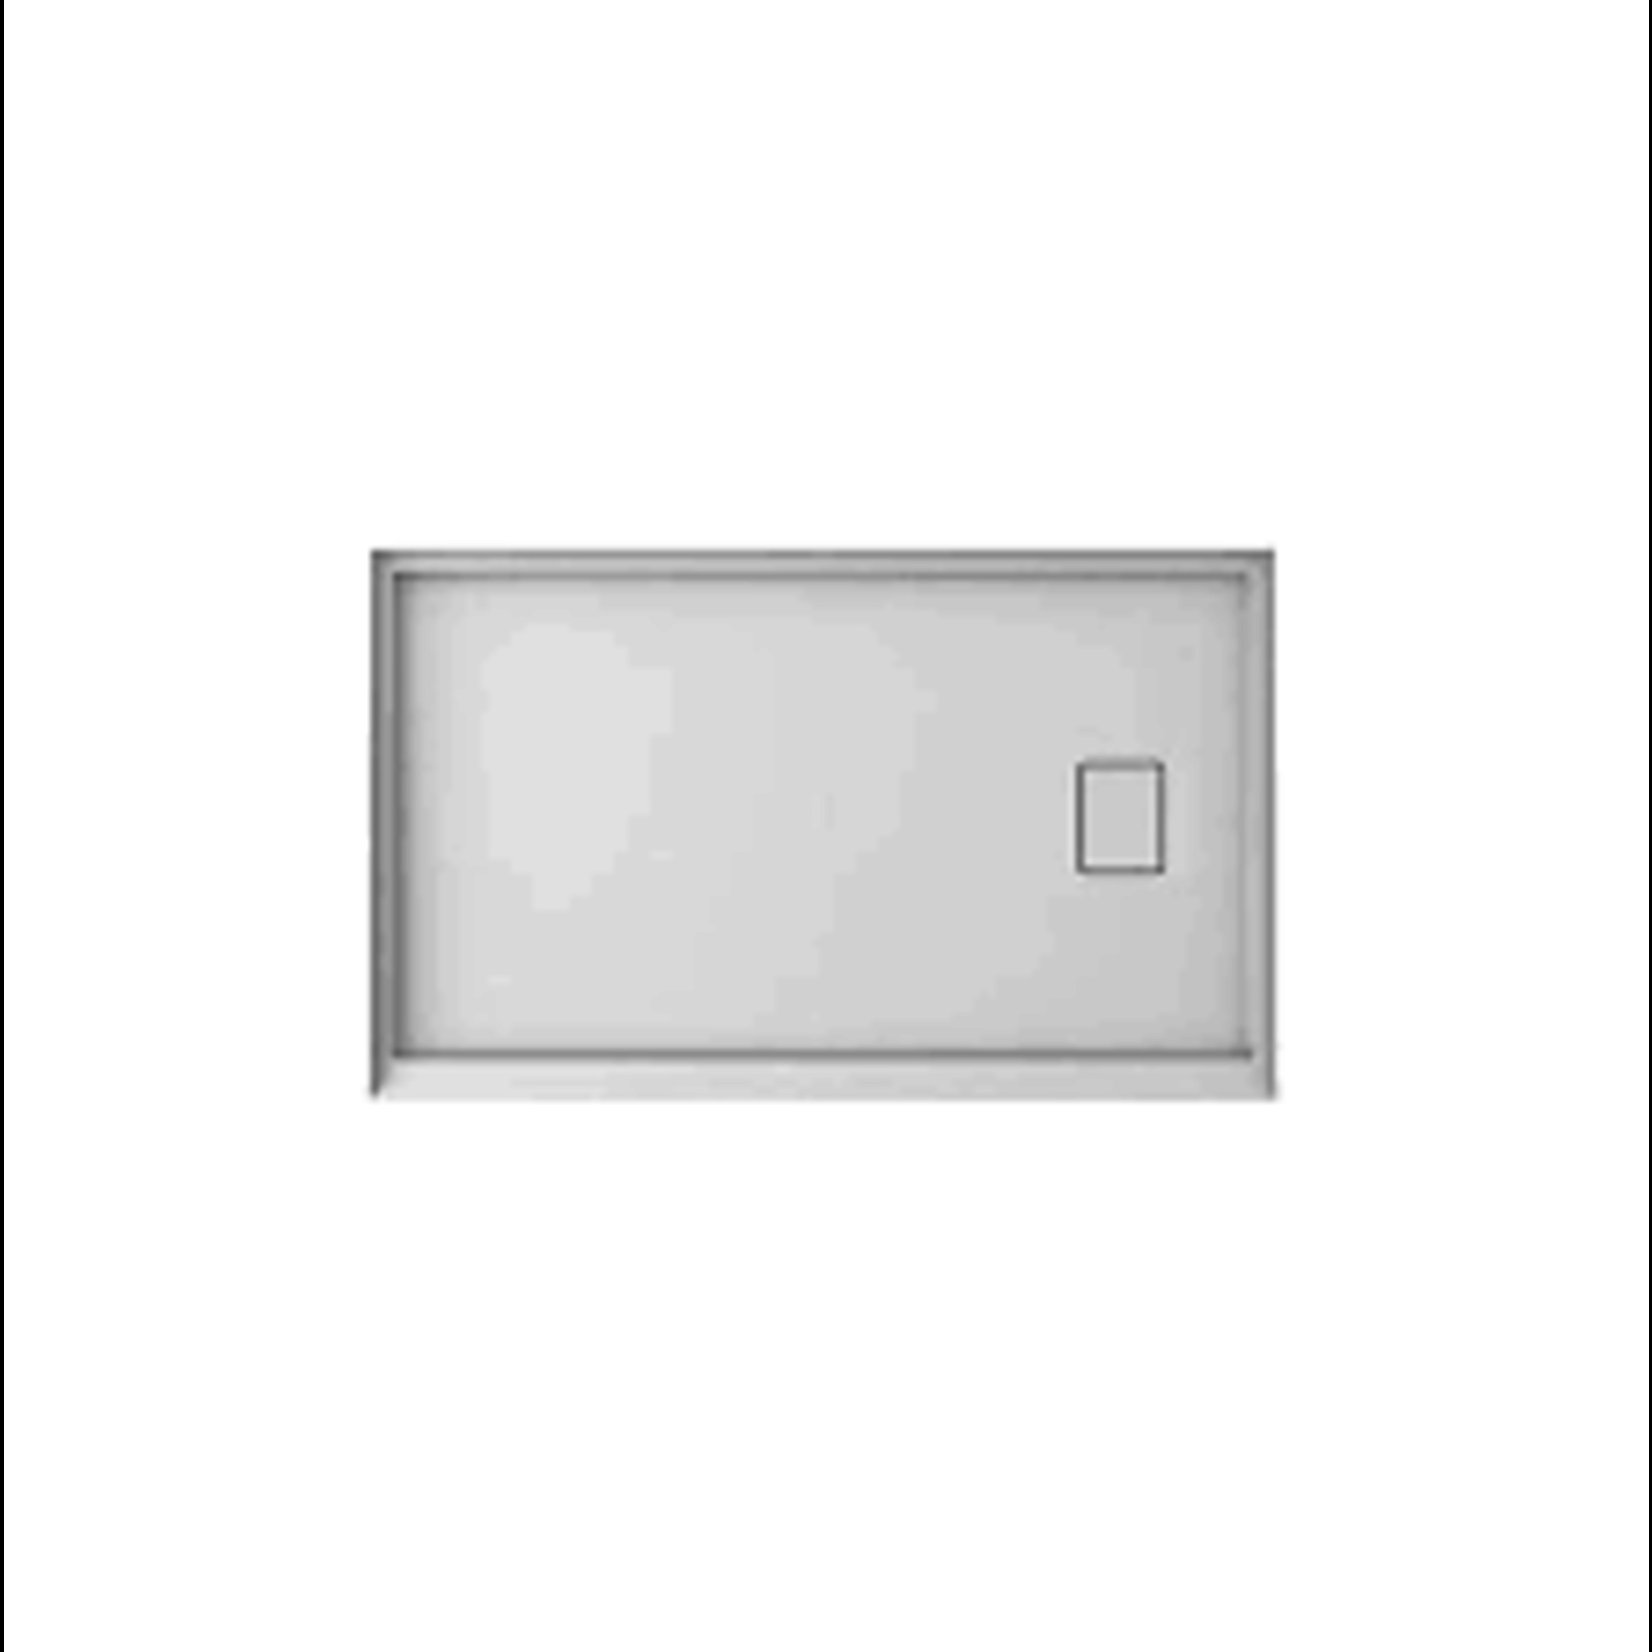 Base de douche 36x60 drain central avec cache drain Installation Universelle CD-78066